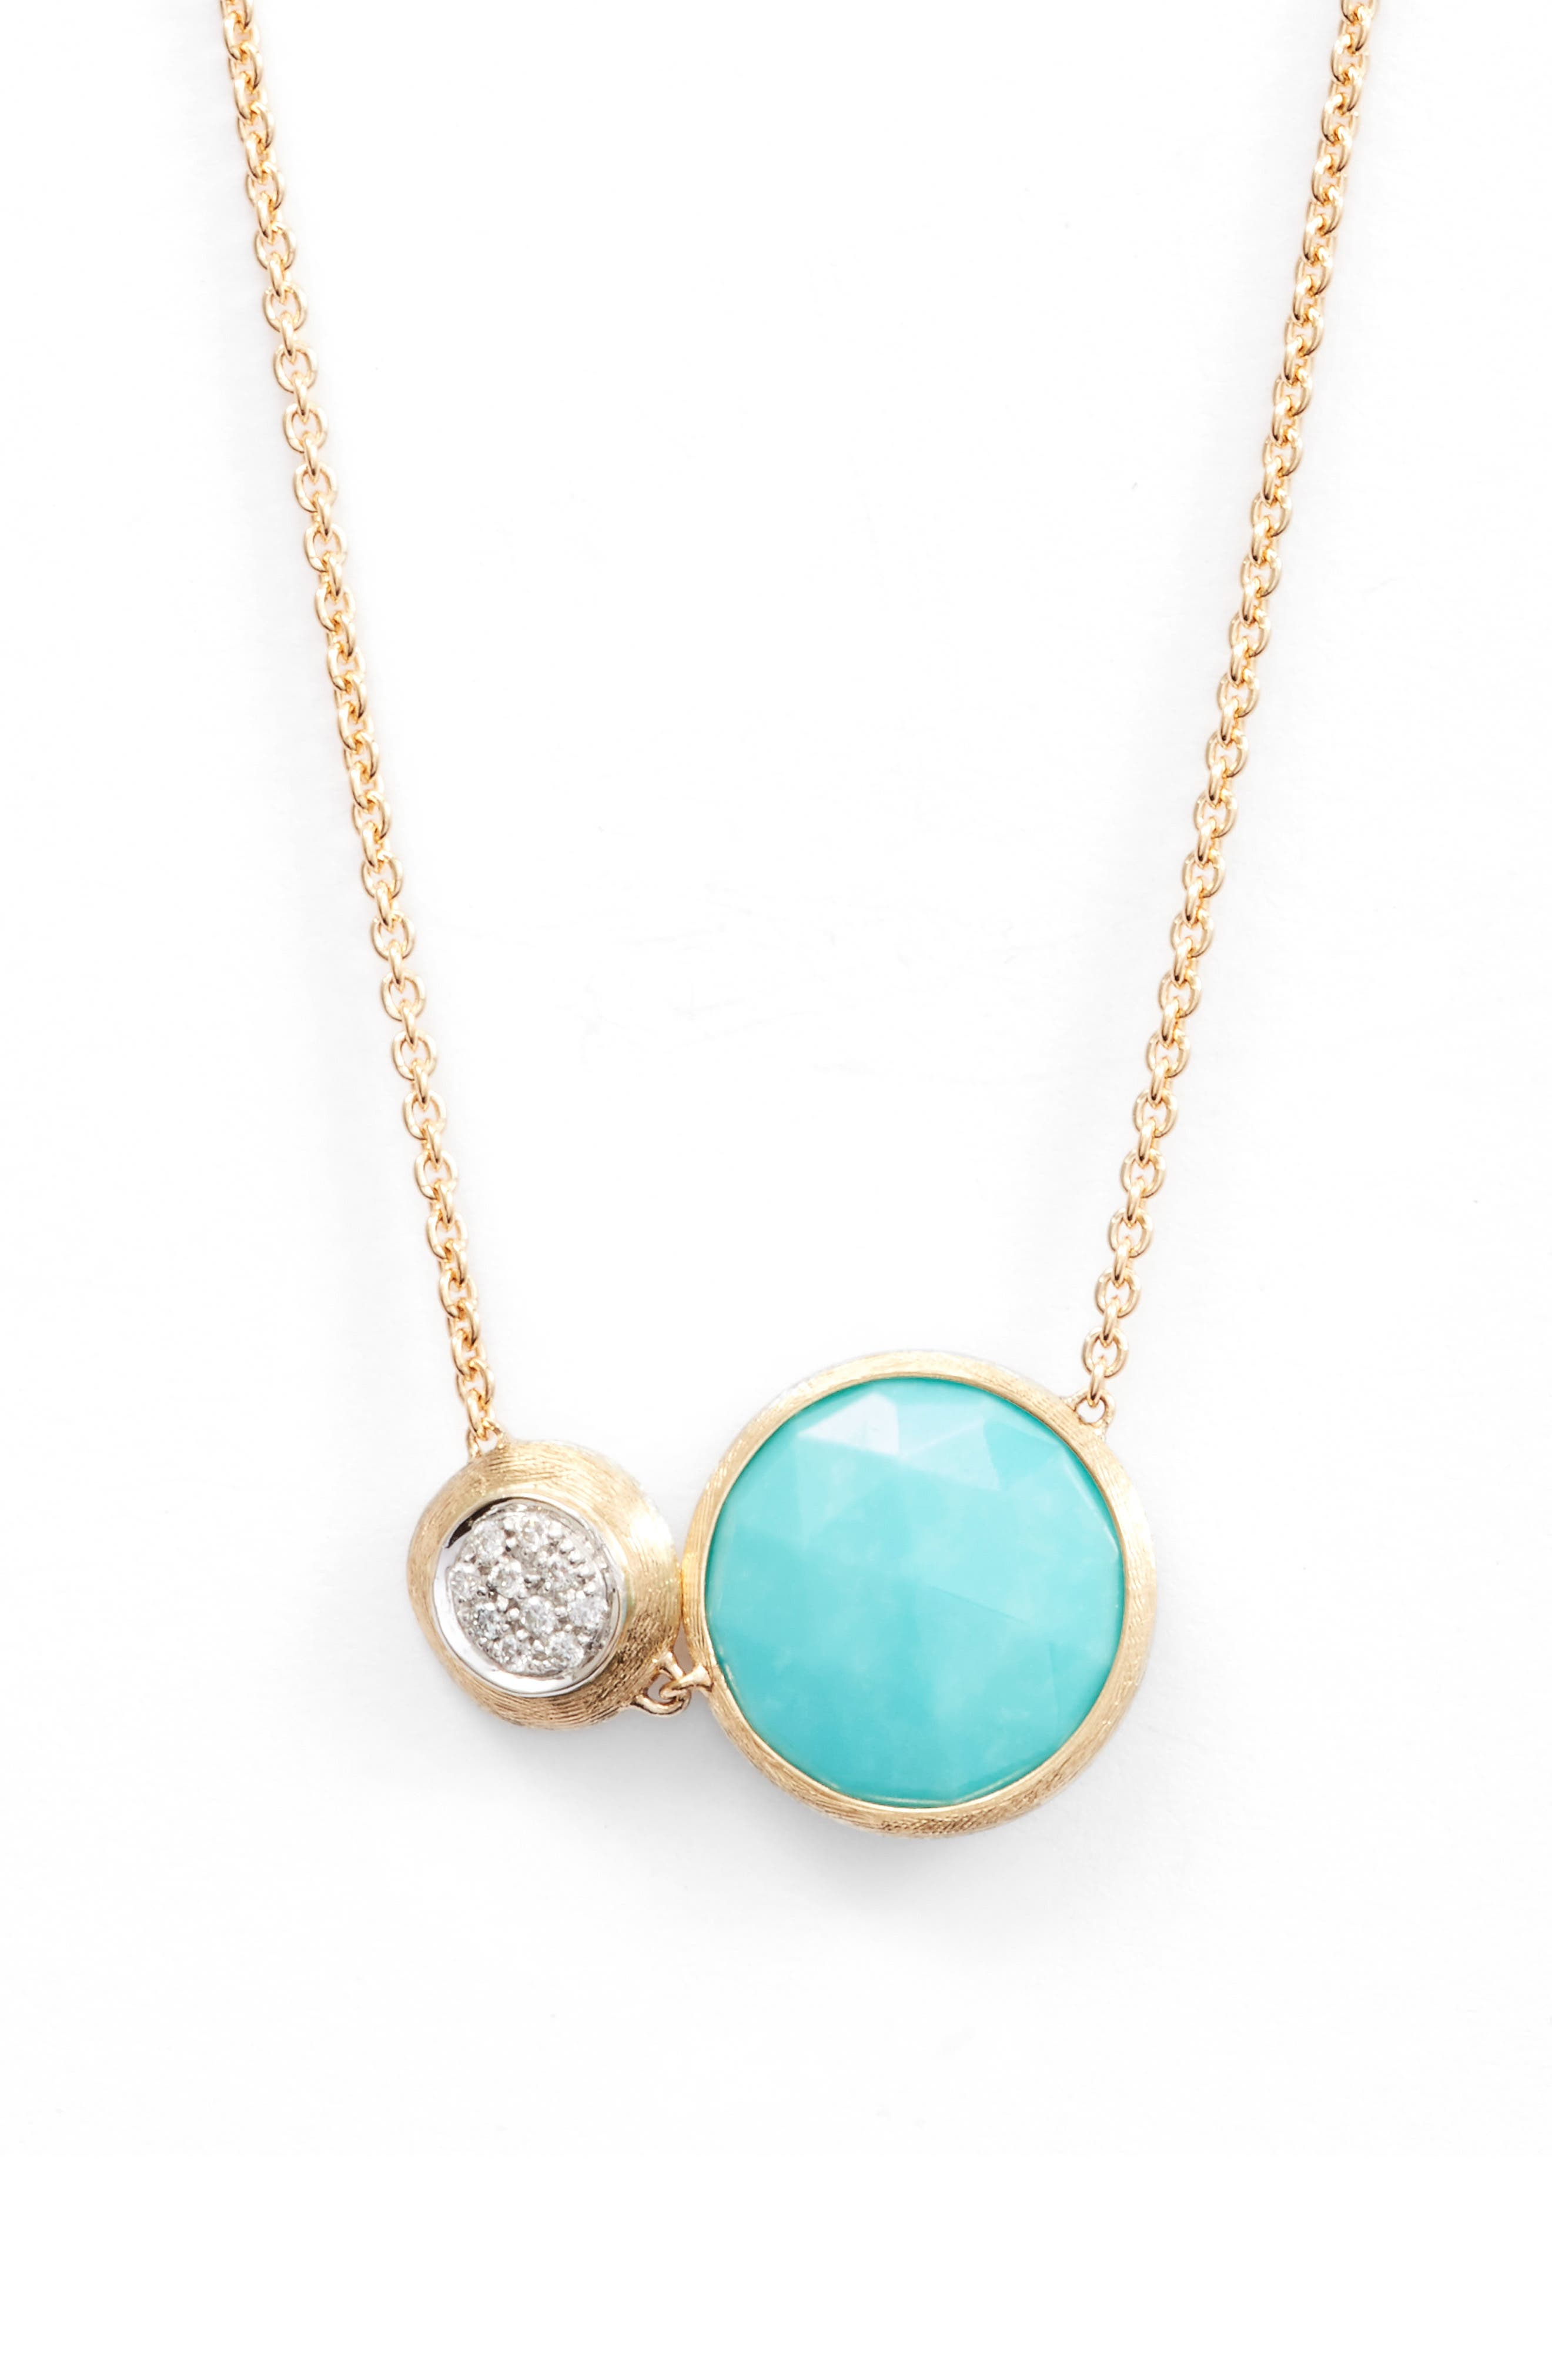 MARCO BICEGO Jaipur Turquoise & Diamond Pendant Necklace